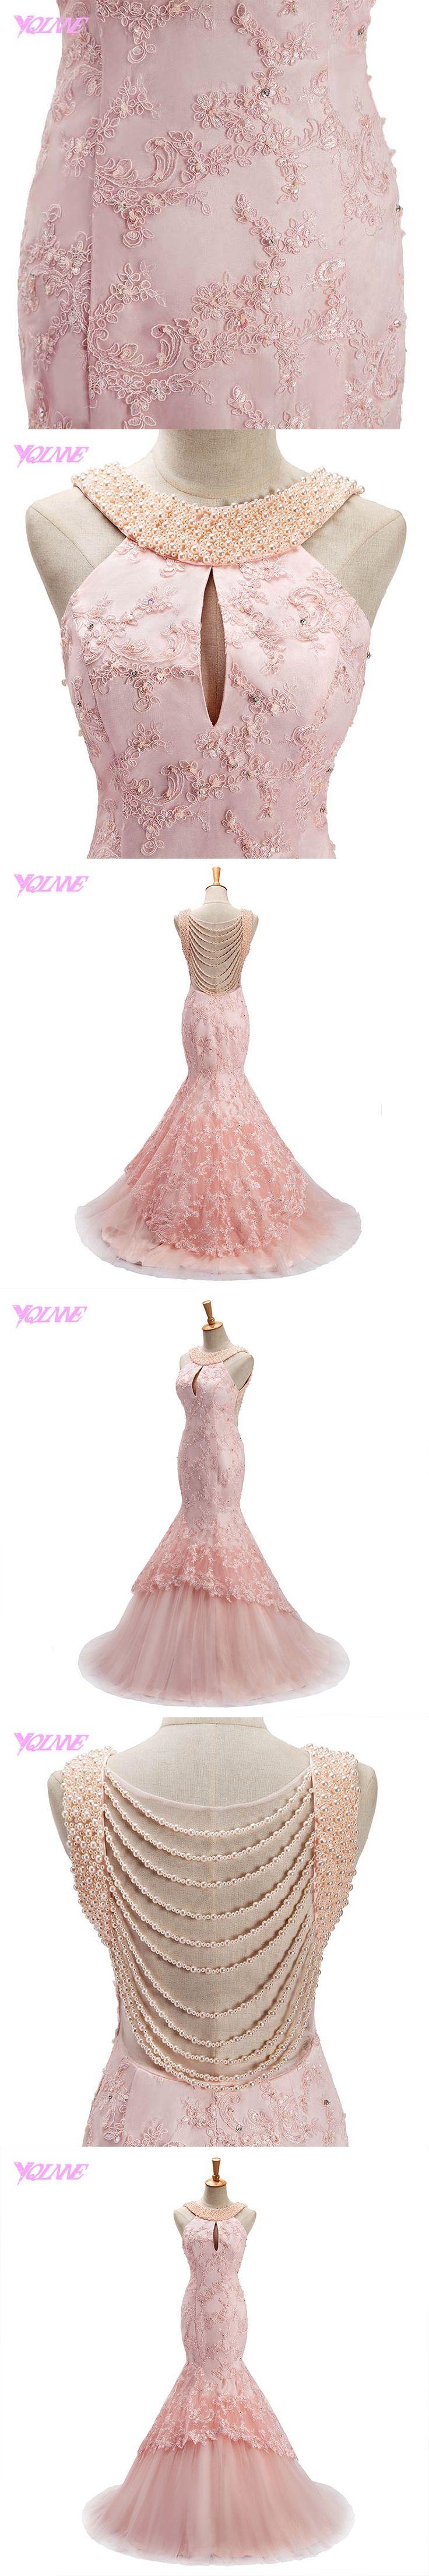 YQLNNE 2018 Blush Pink Long Prom Dresses Mermaid Evening Gown Halter Lace Tulle Pearls Vestido De Festa